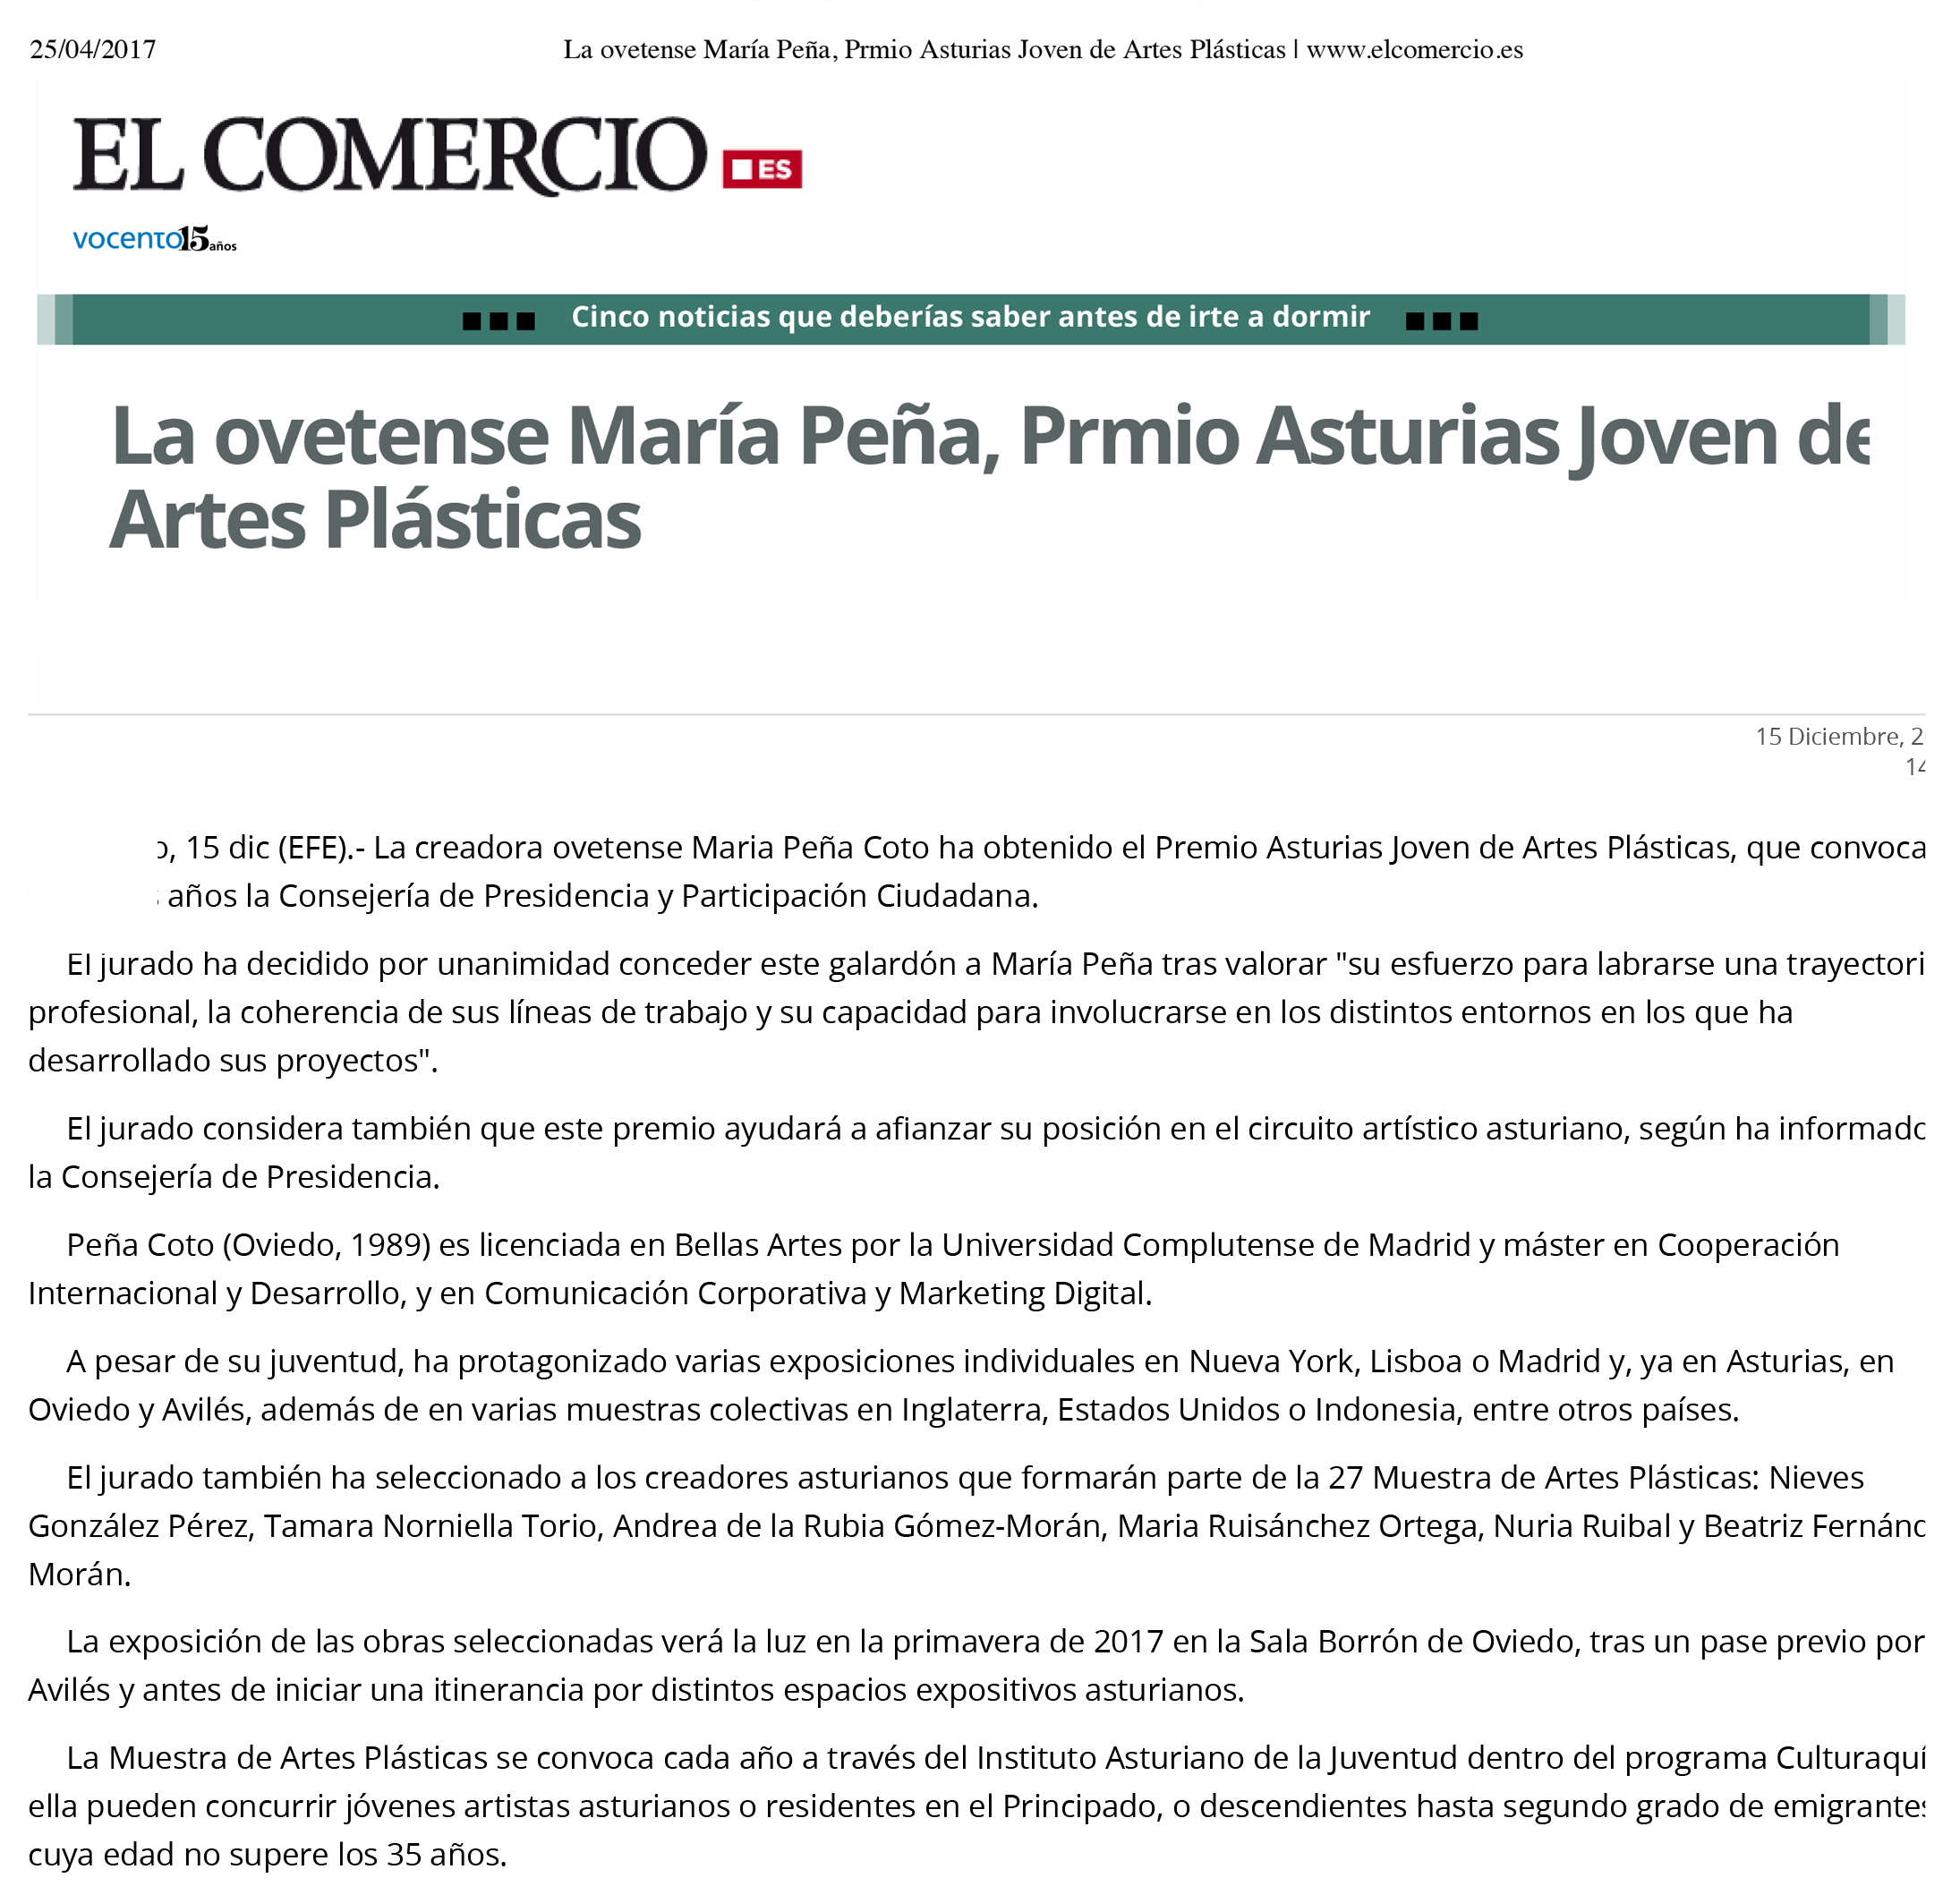 http://www.elcomercio.es/agencias/asturias/201612/15/ovetense-maria-penia-prmio-846545.html